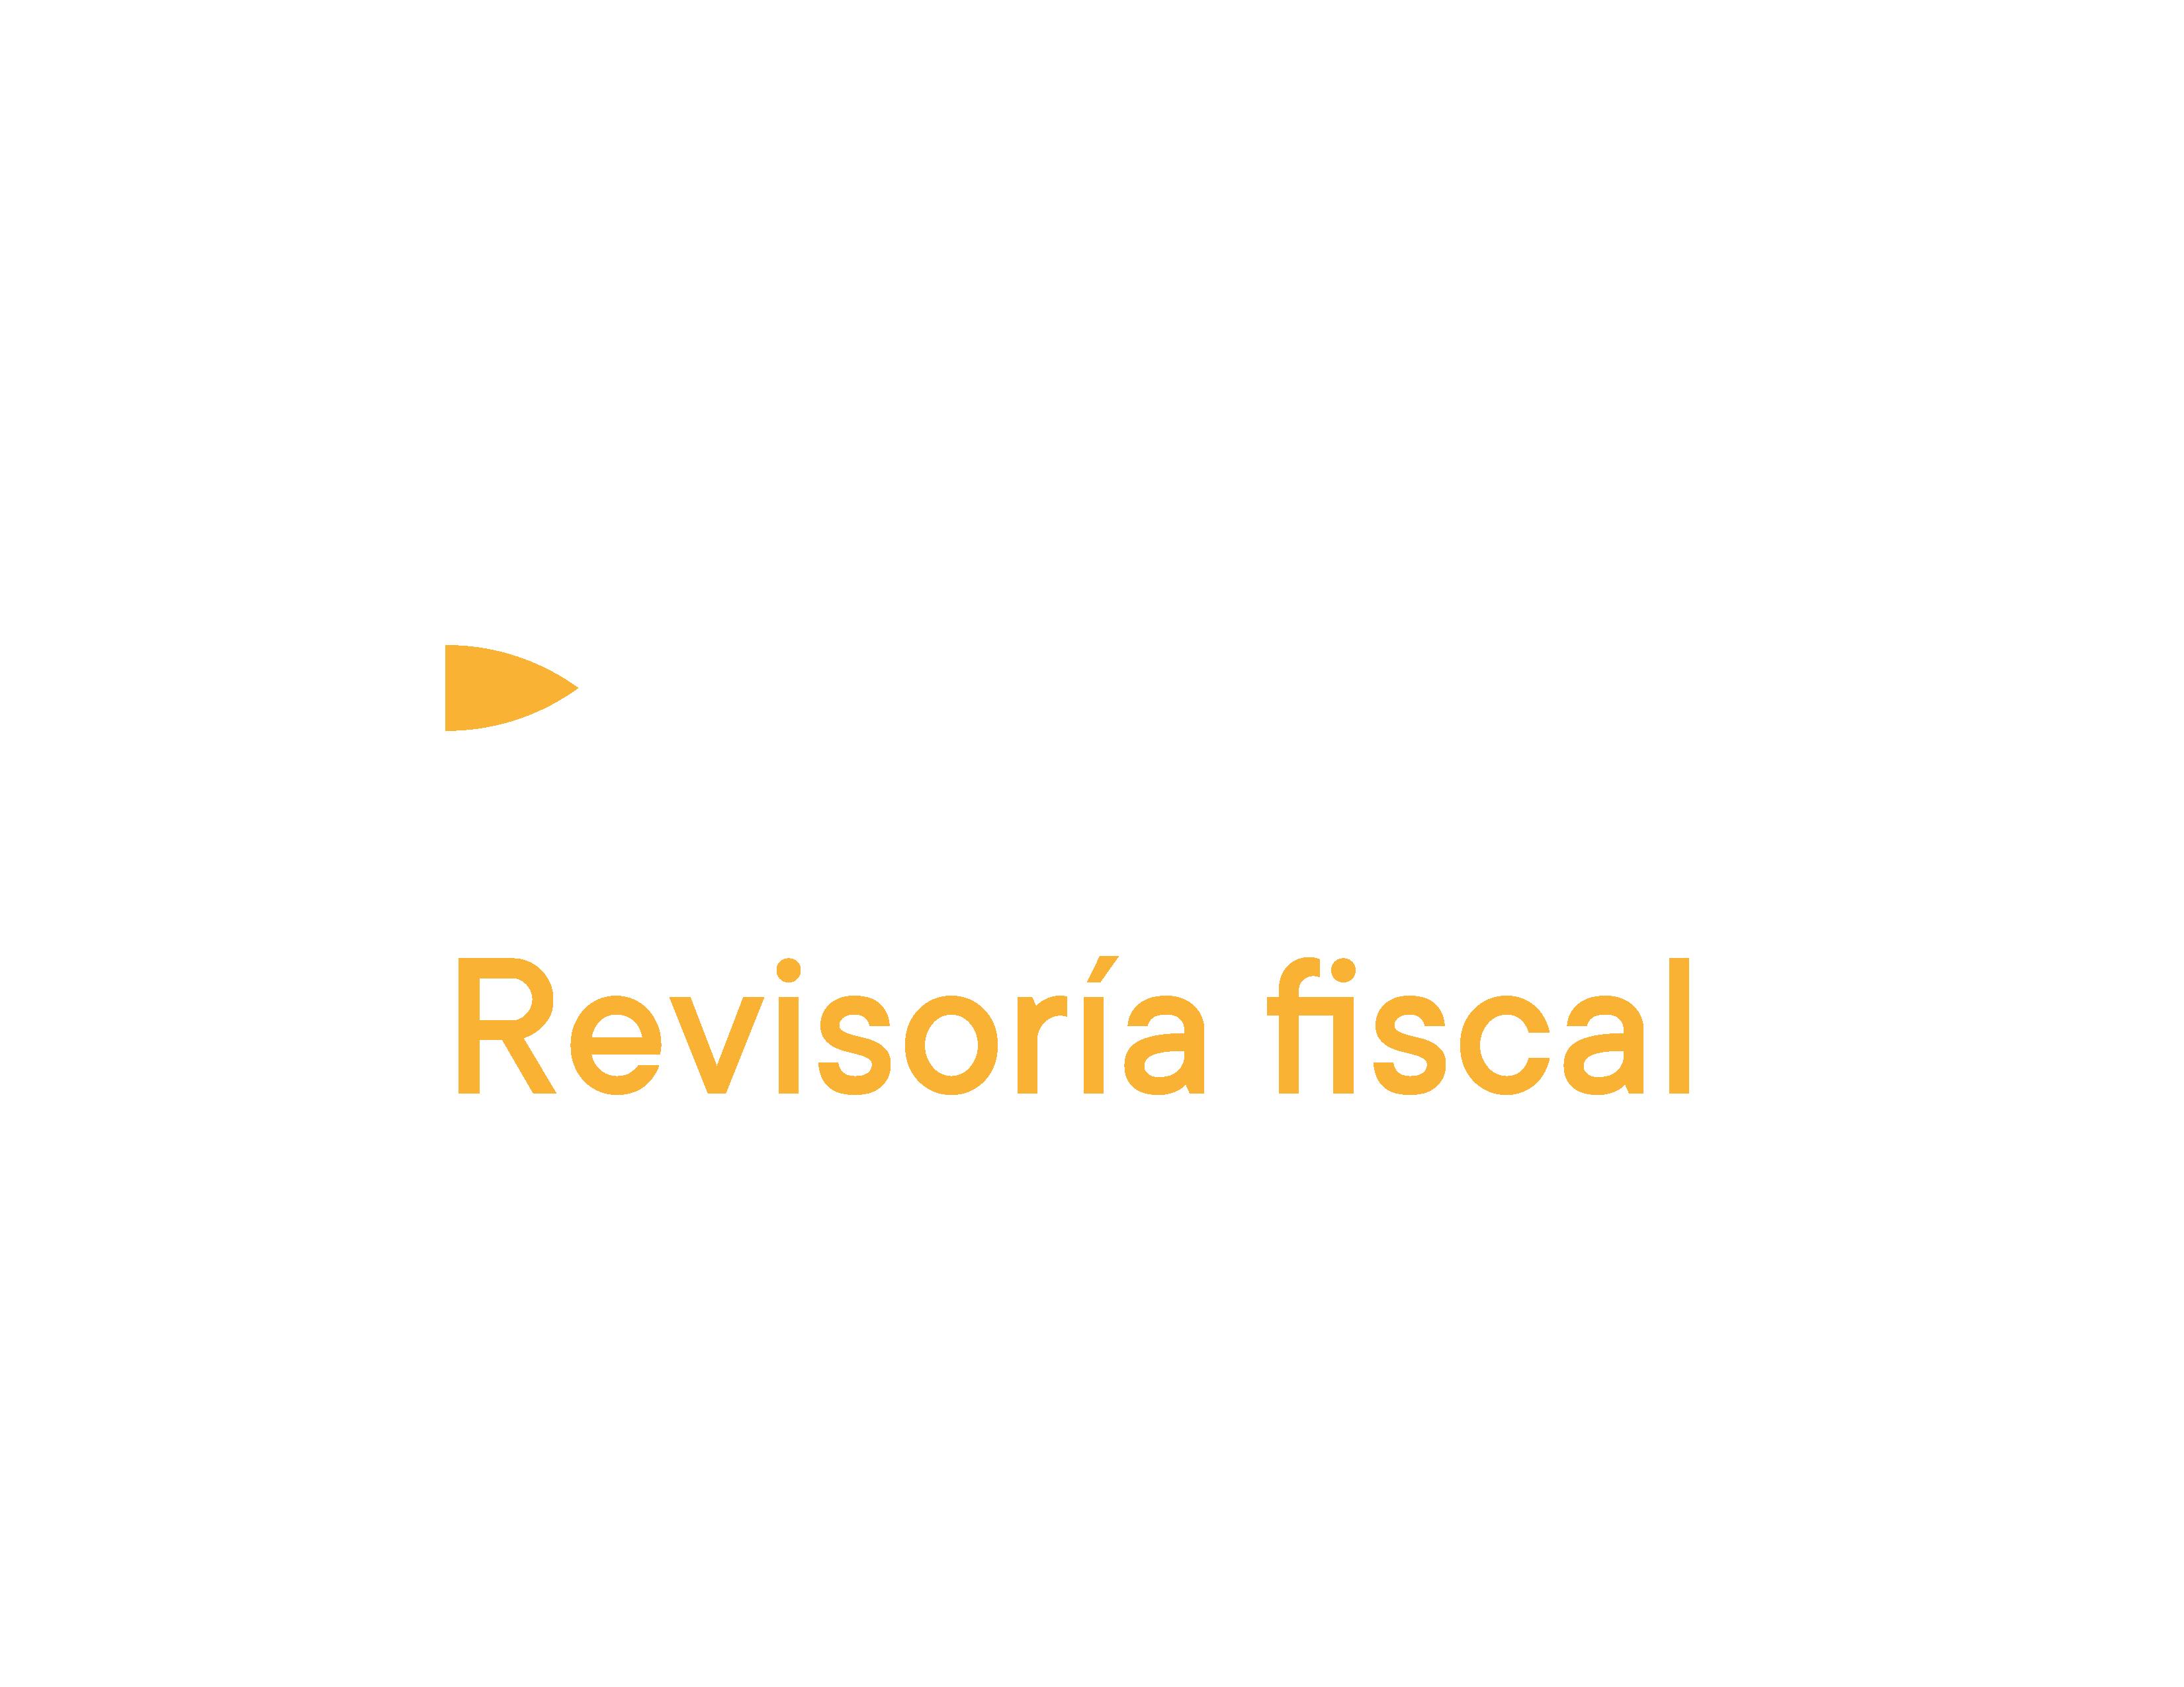 DBL_lineas_ negocio_fiscal_logotipo_negativo